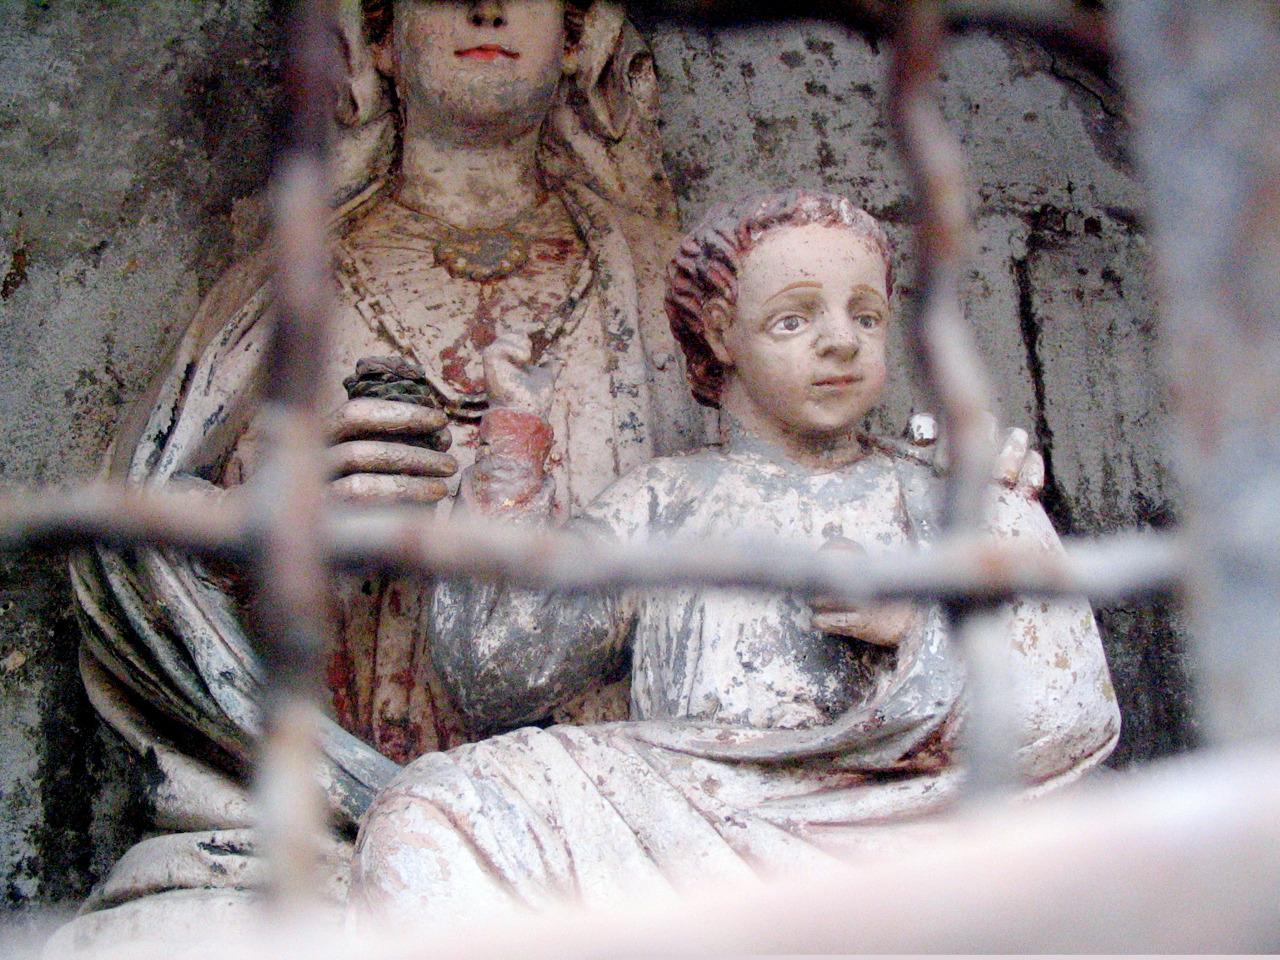 Jezus in Burgos